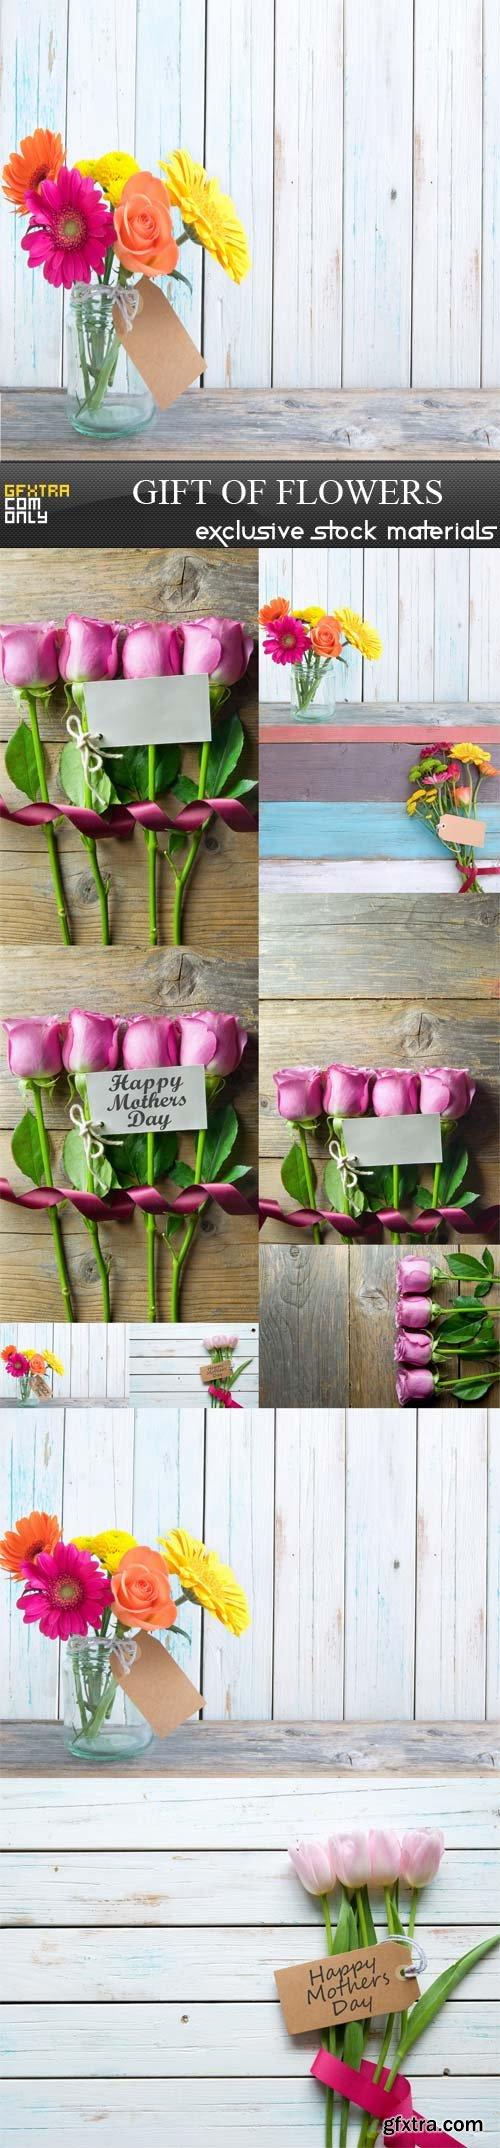 Gift of flowers, 10 UHQ JPEG